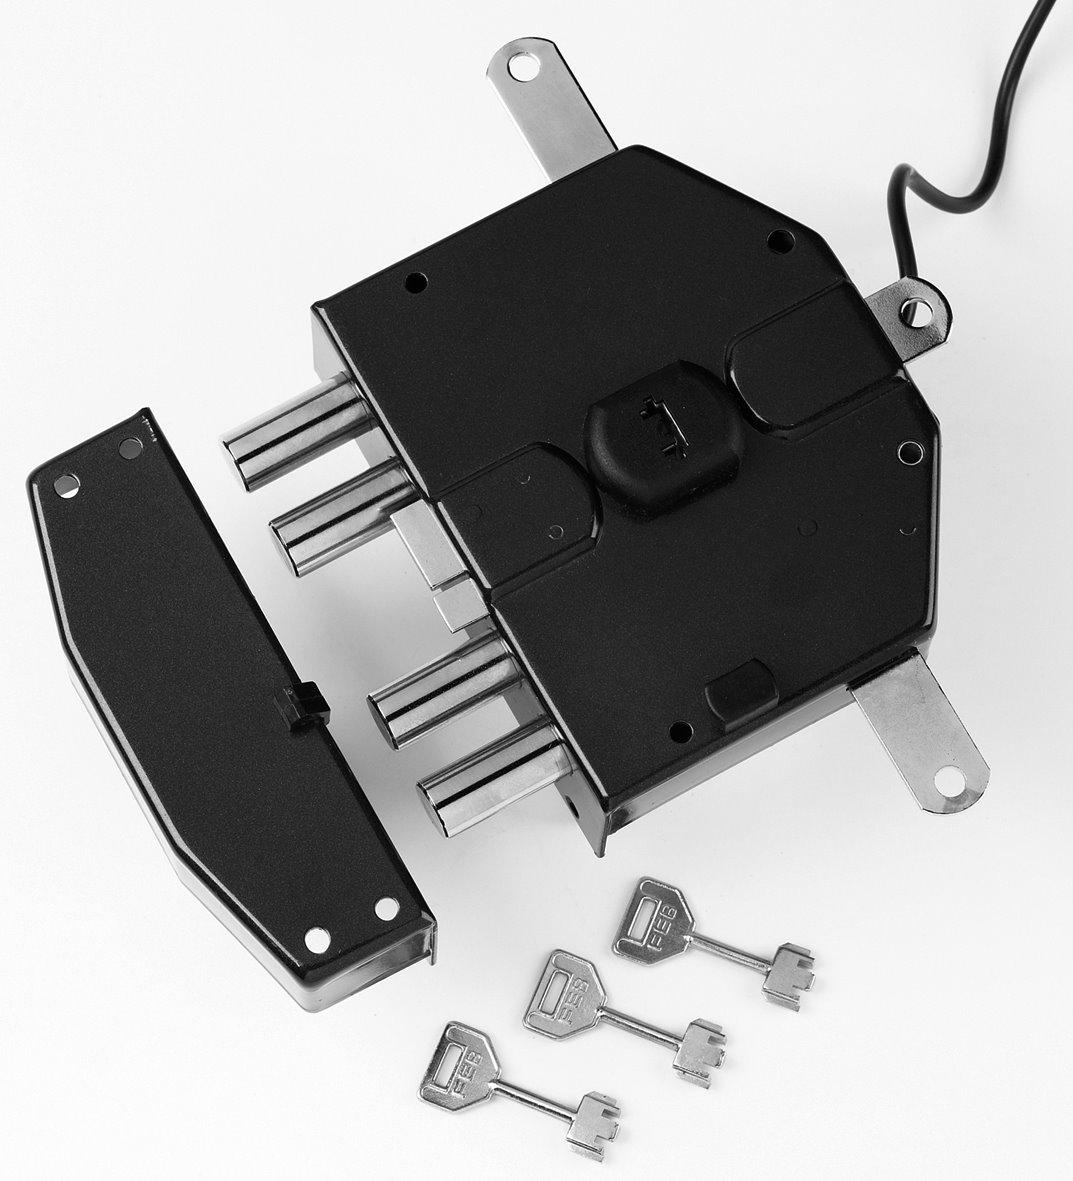 6825 - Security electric rim lock, 5 locking points